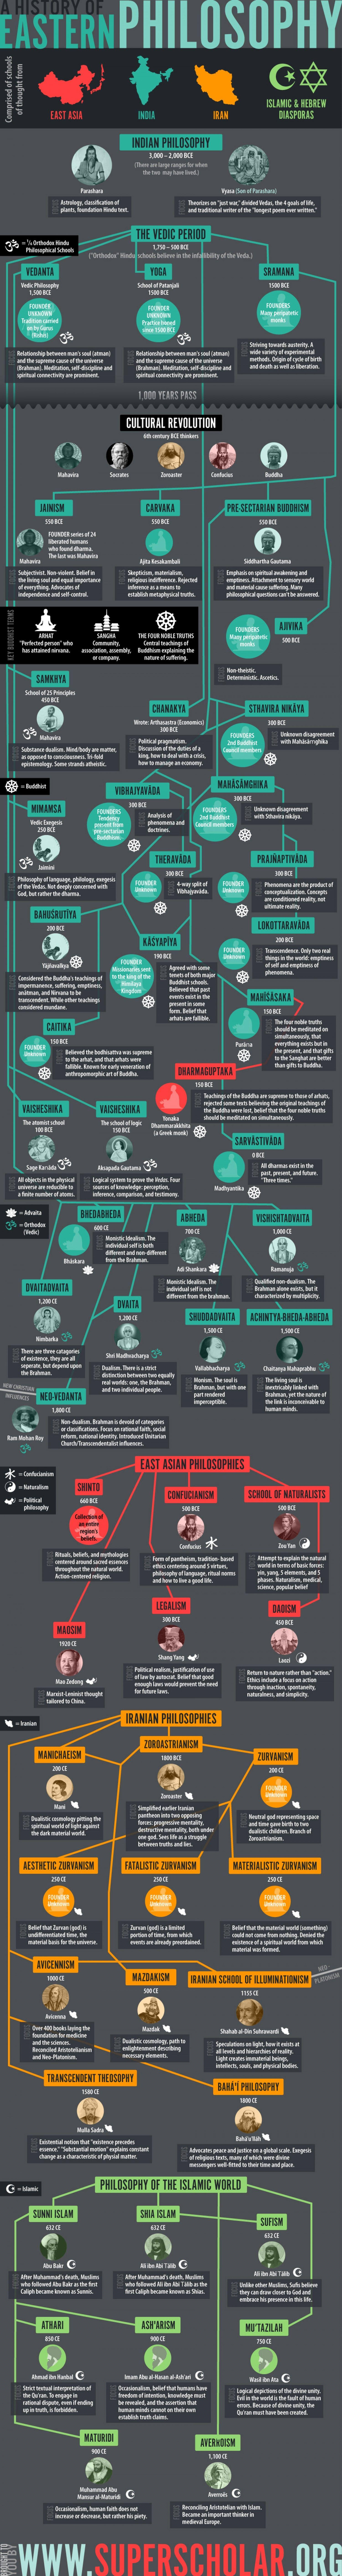 History Of Eastern Philosophy